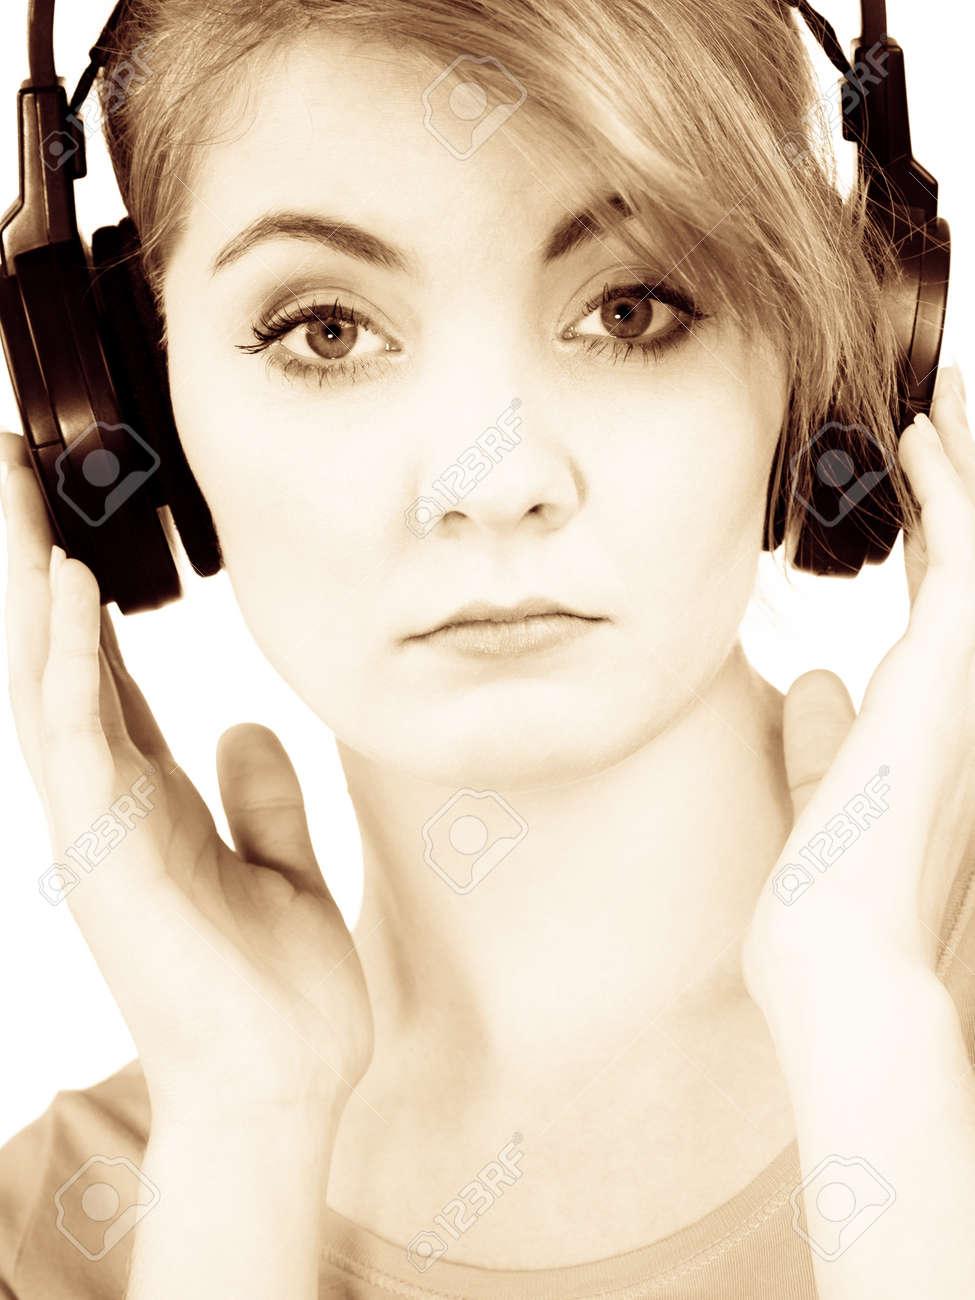 Woman sad unhappy girl in big headphones listening music mp3